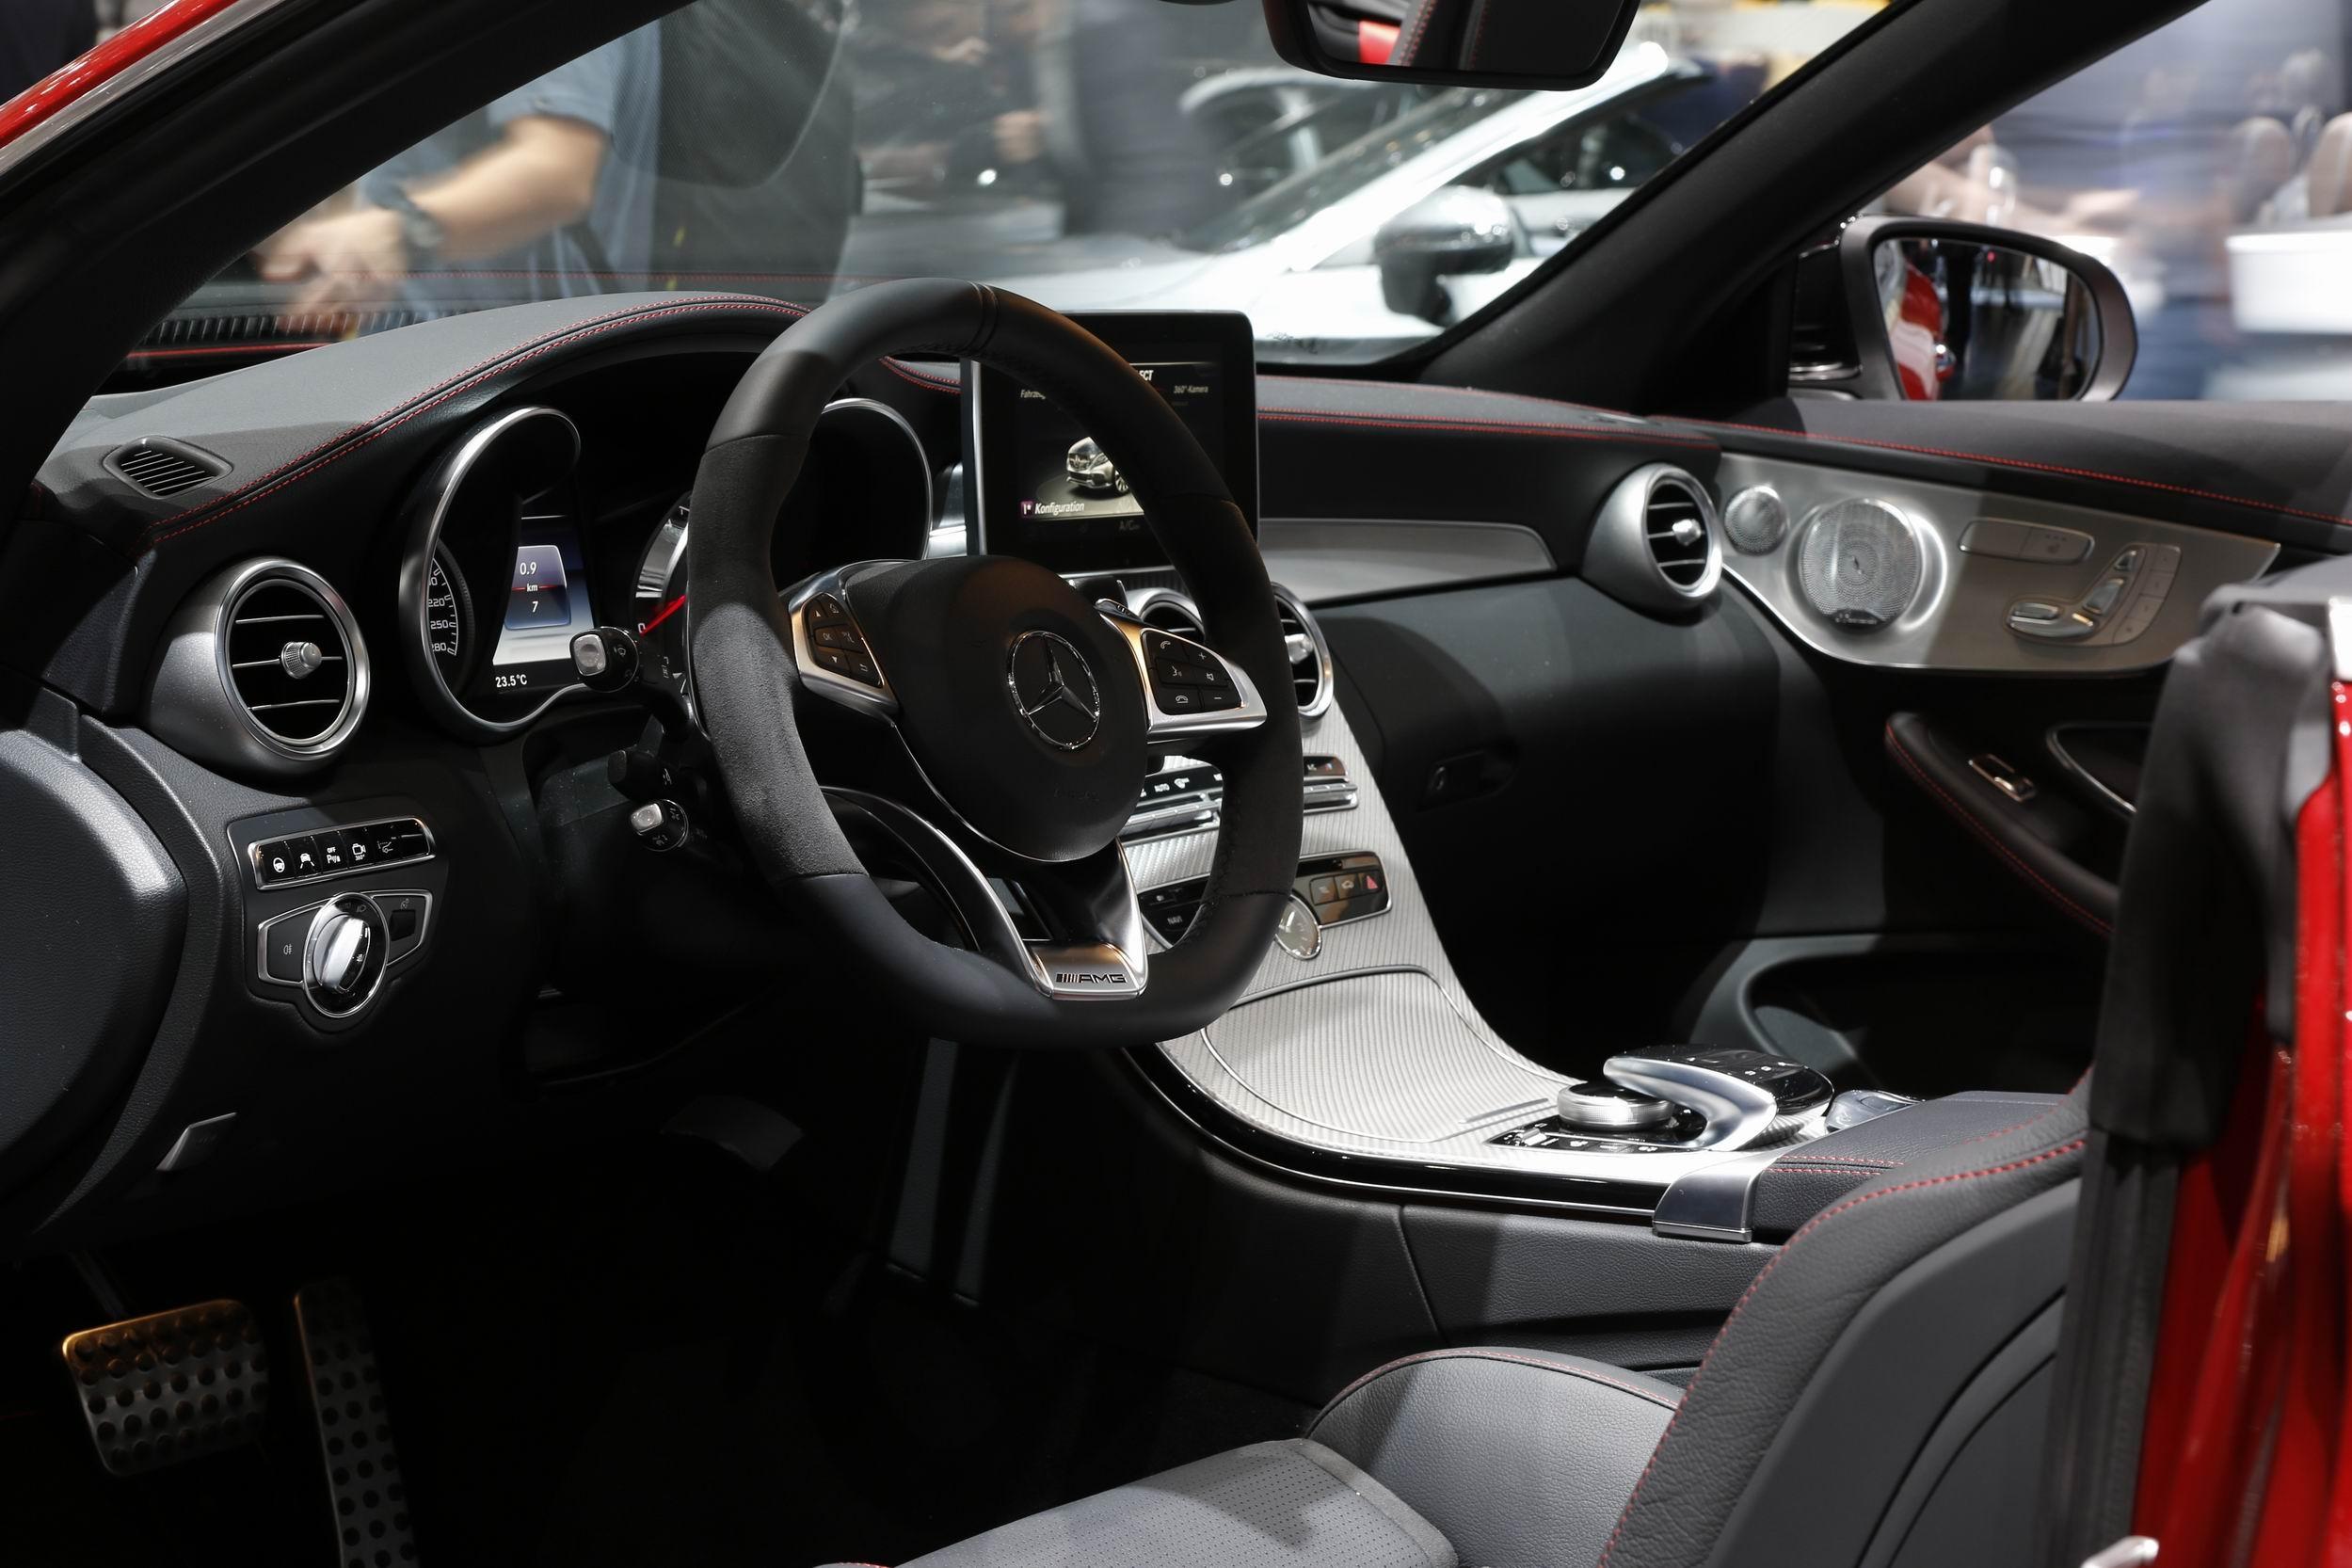 Mercedes Classe C Cabriolet Premi 232 Re Du Nom Vid 233 O En